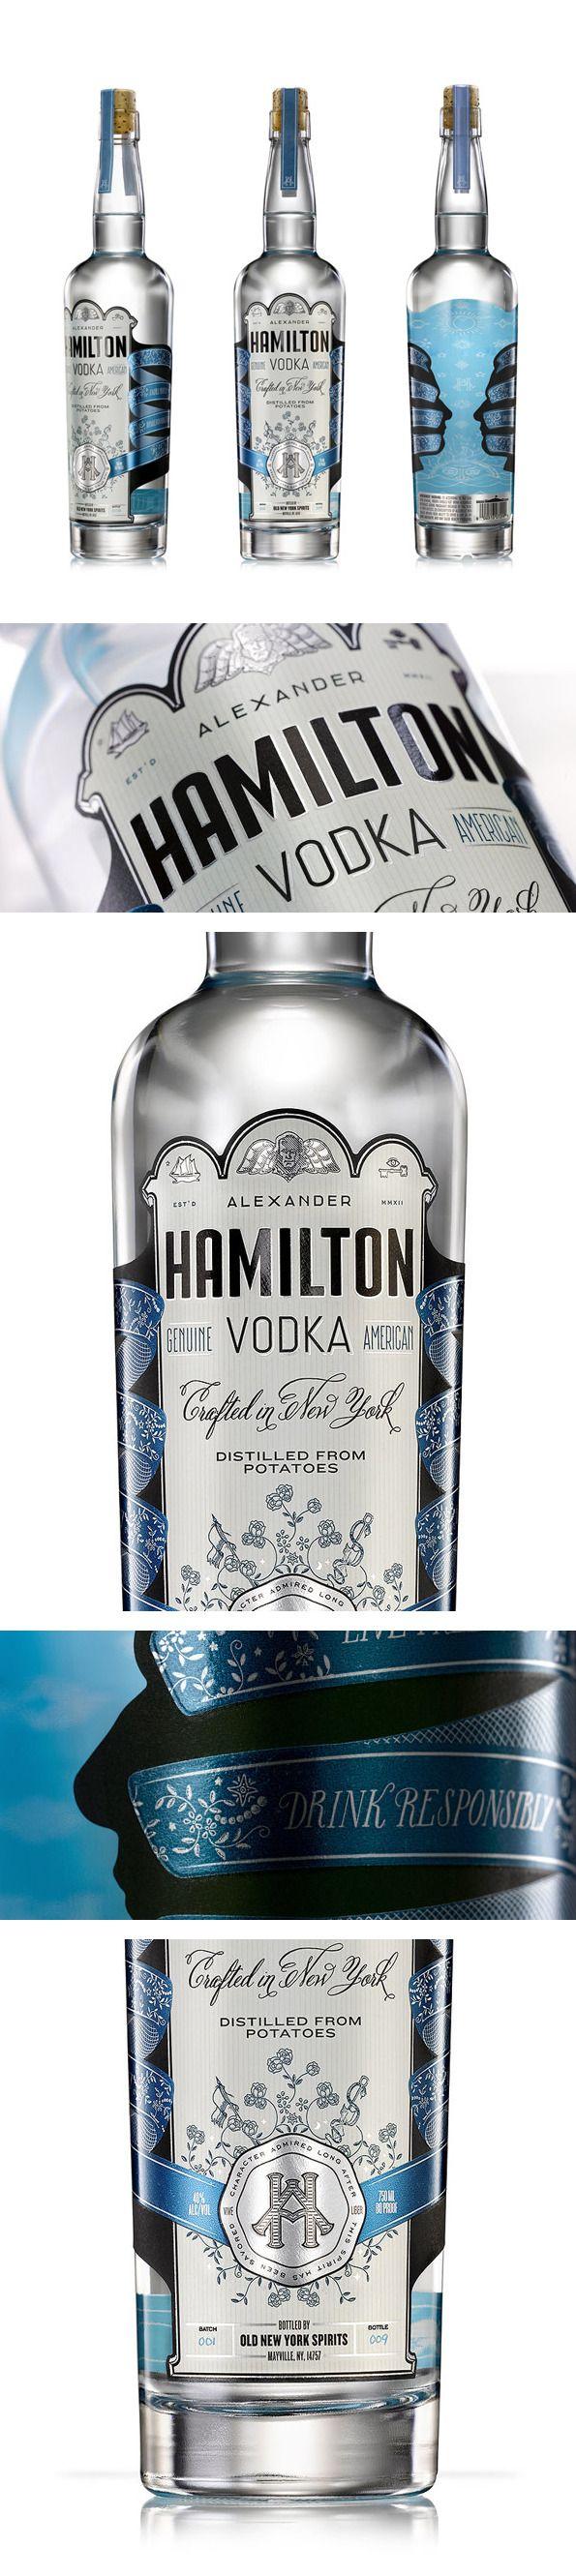 Alexander Hamilton Vodka By Steven Bonner